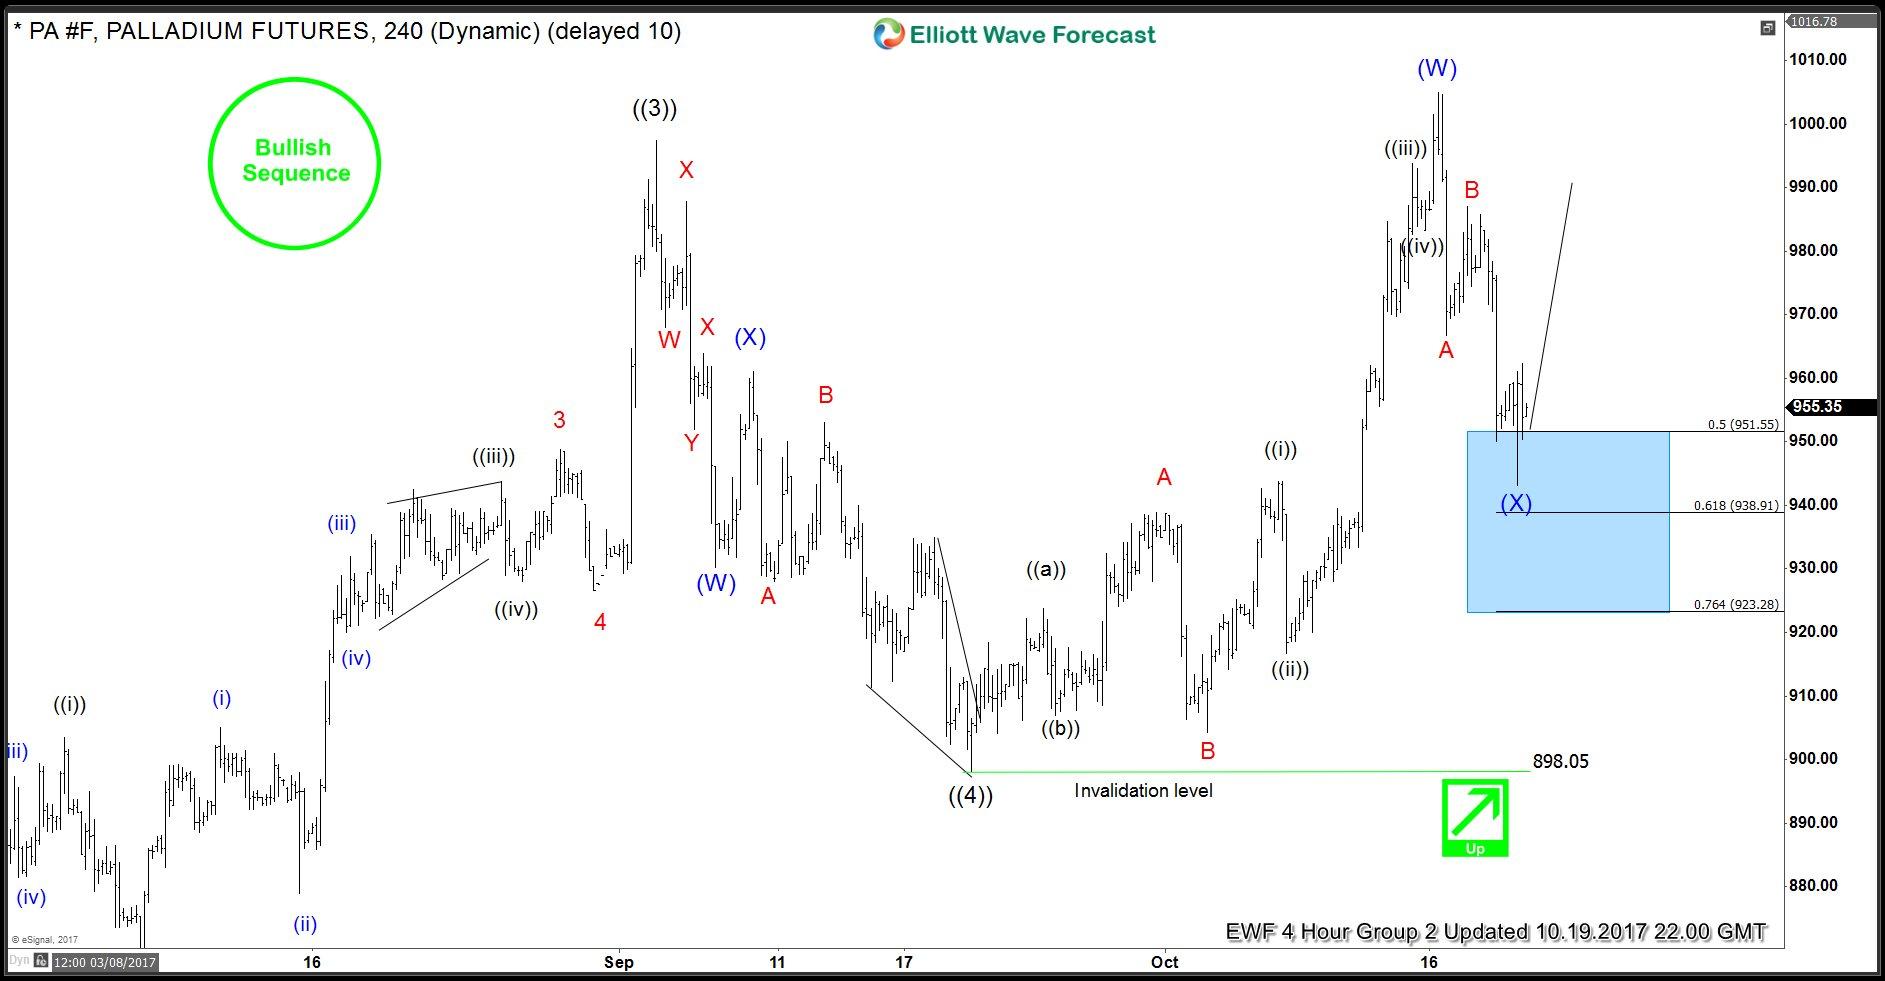 Trading Elliott Wave Forecast Charts